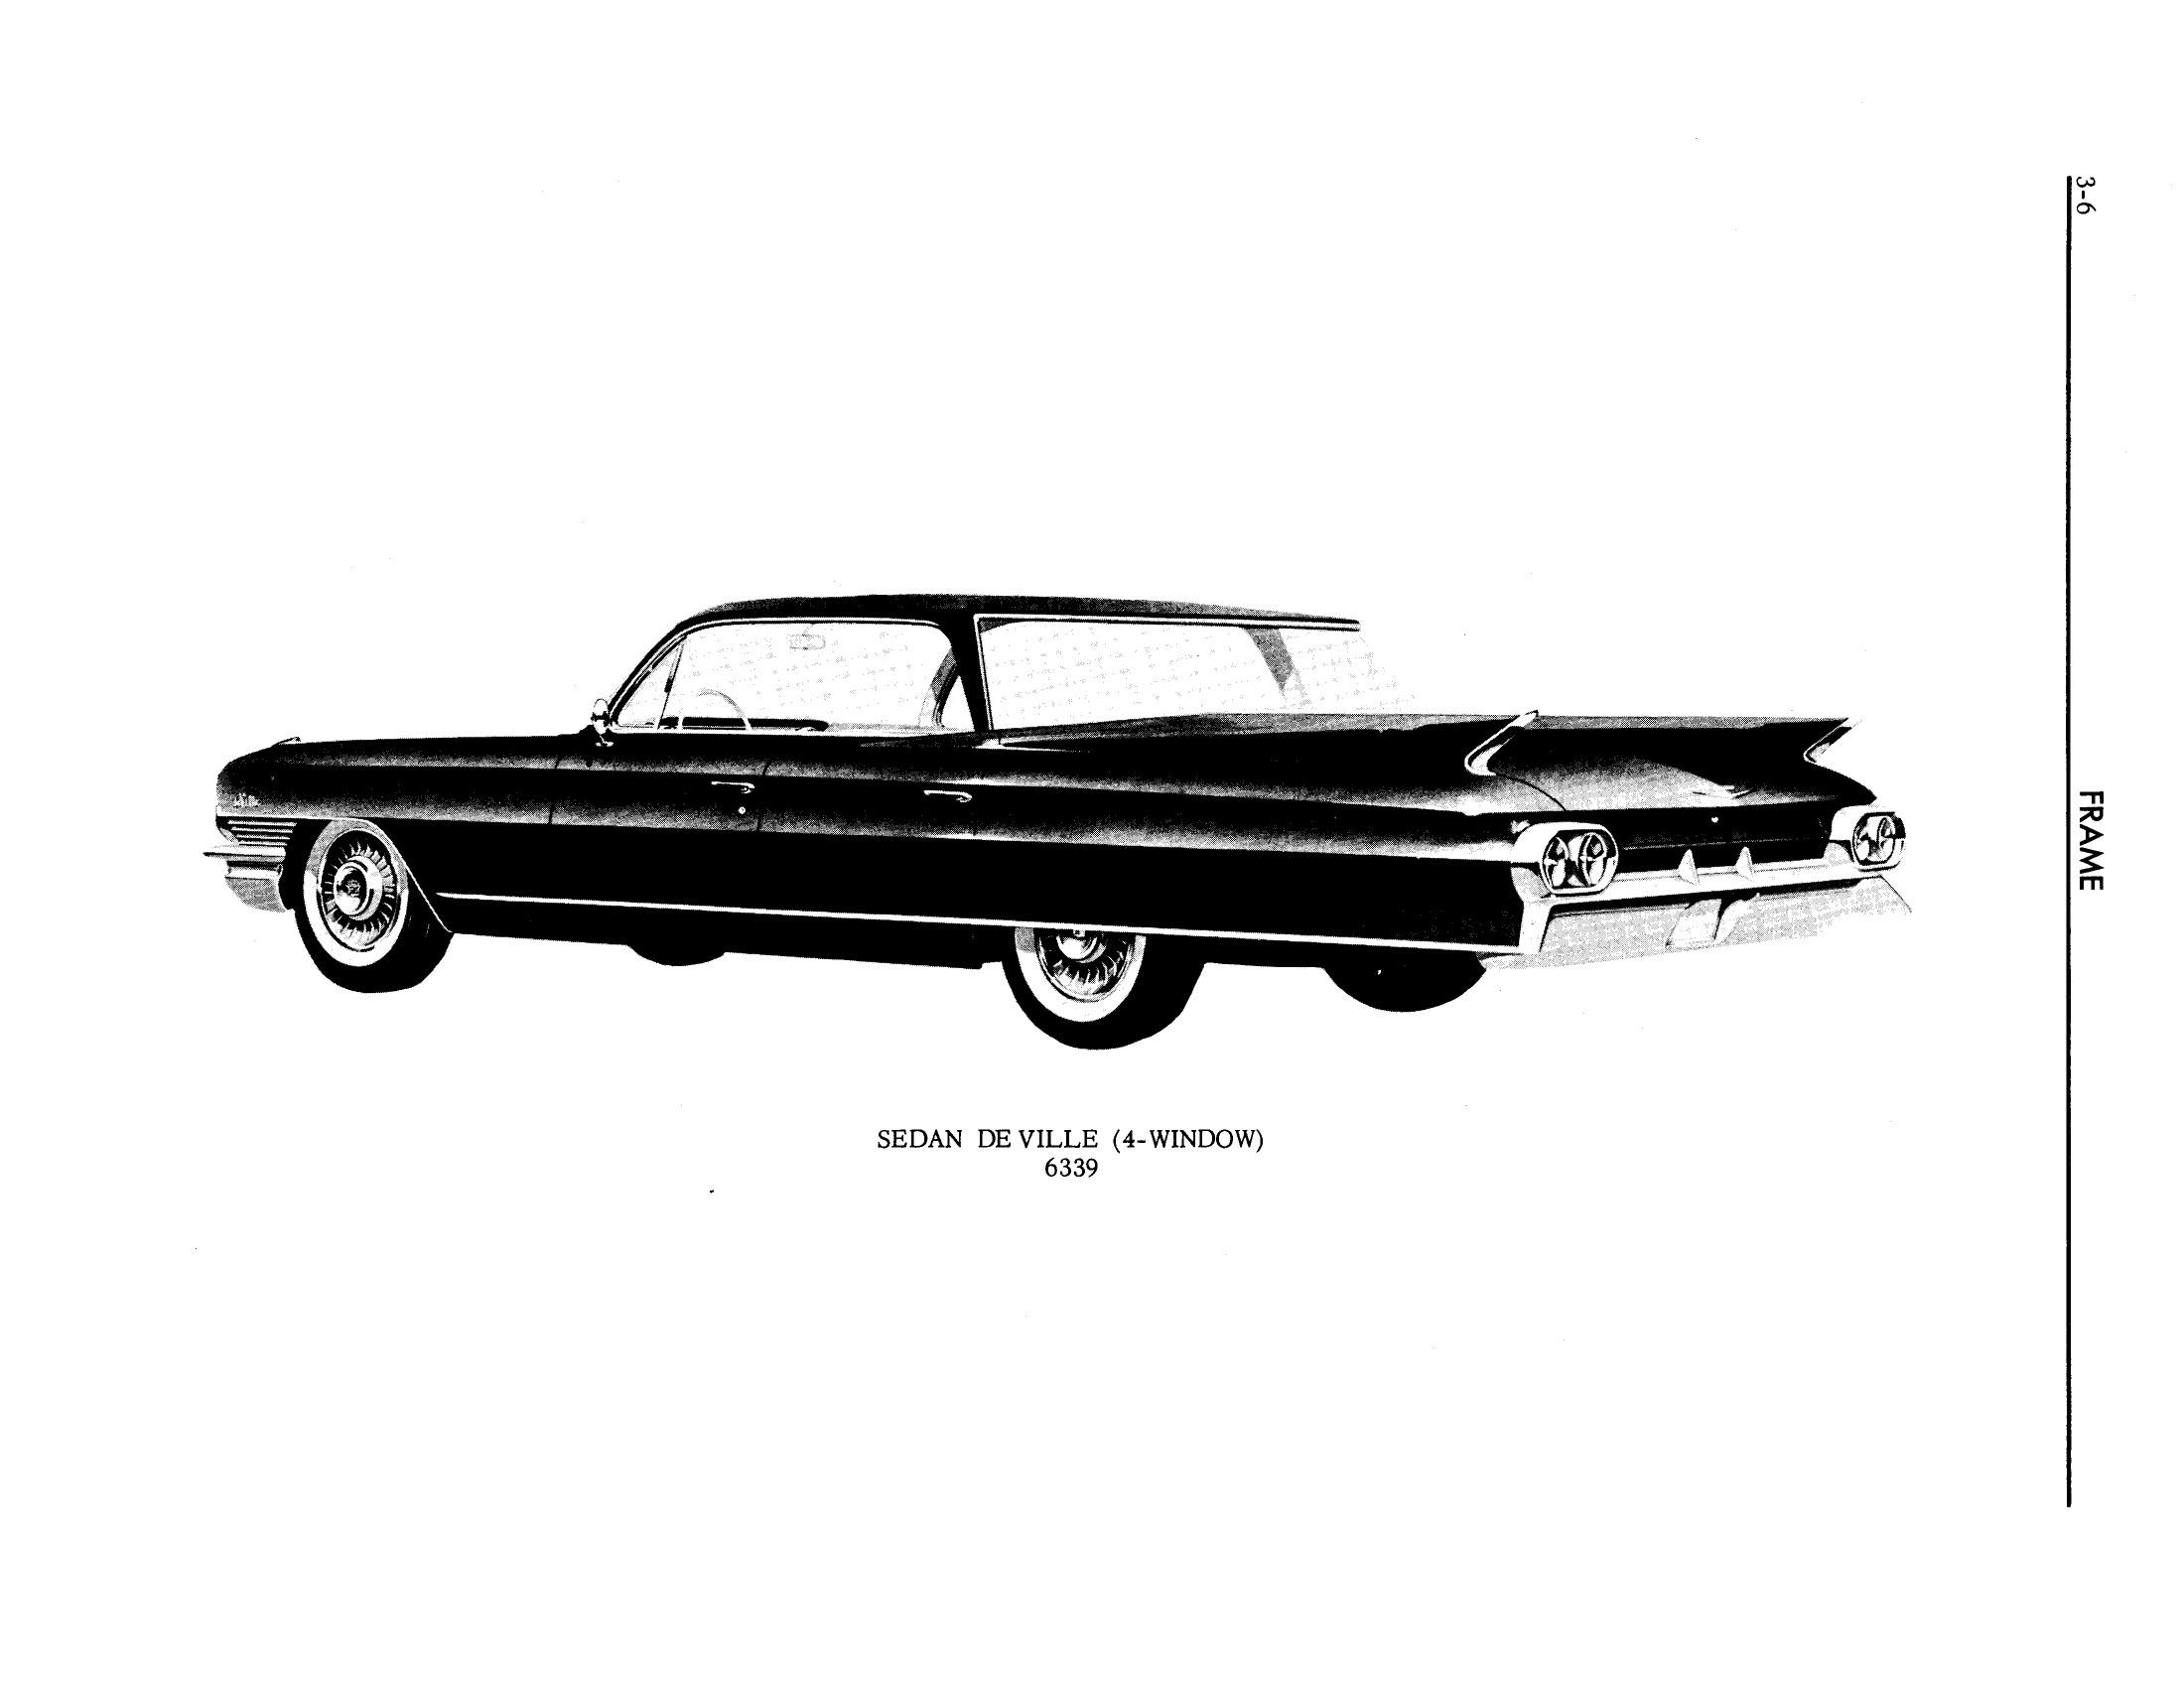 1961 Cadillac Shop Manual- Frame Page 6 of 6